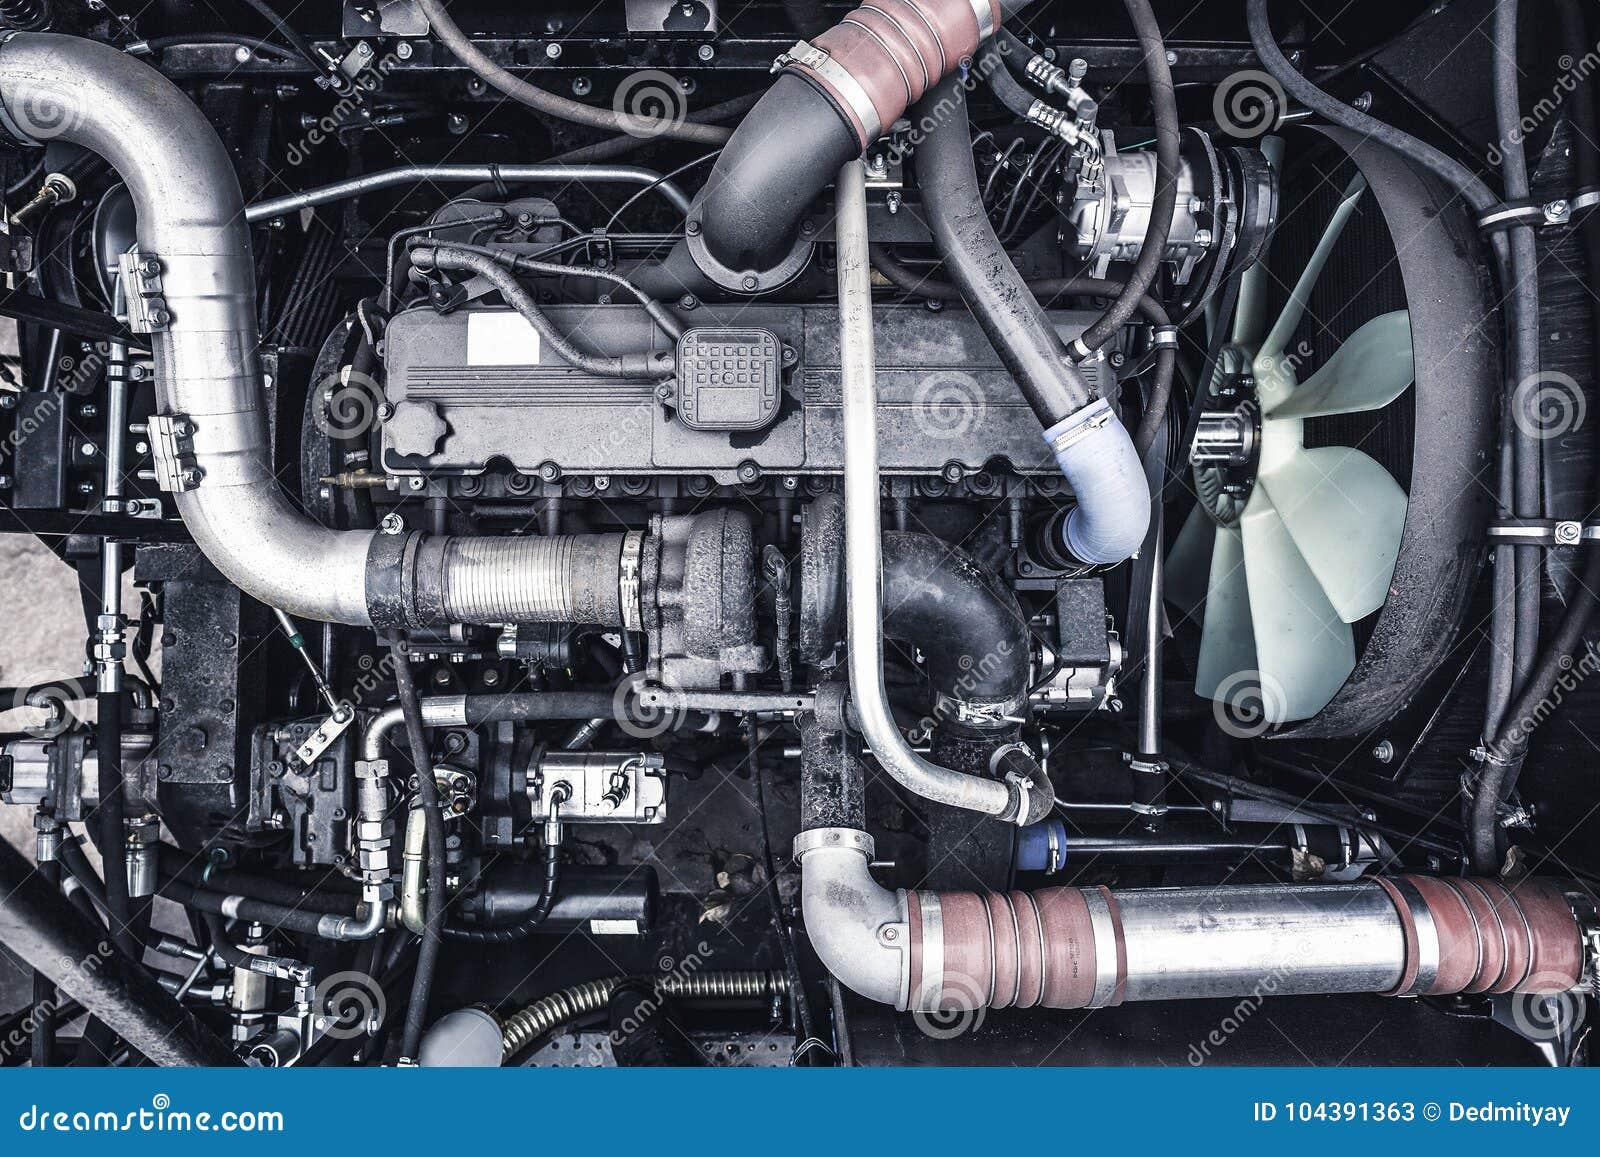 tractor engine stock images 9 504 photos. Black Bedroom Furniture Sets. Home Design Ideas